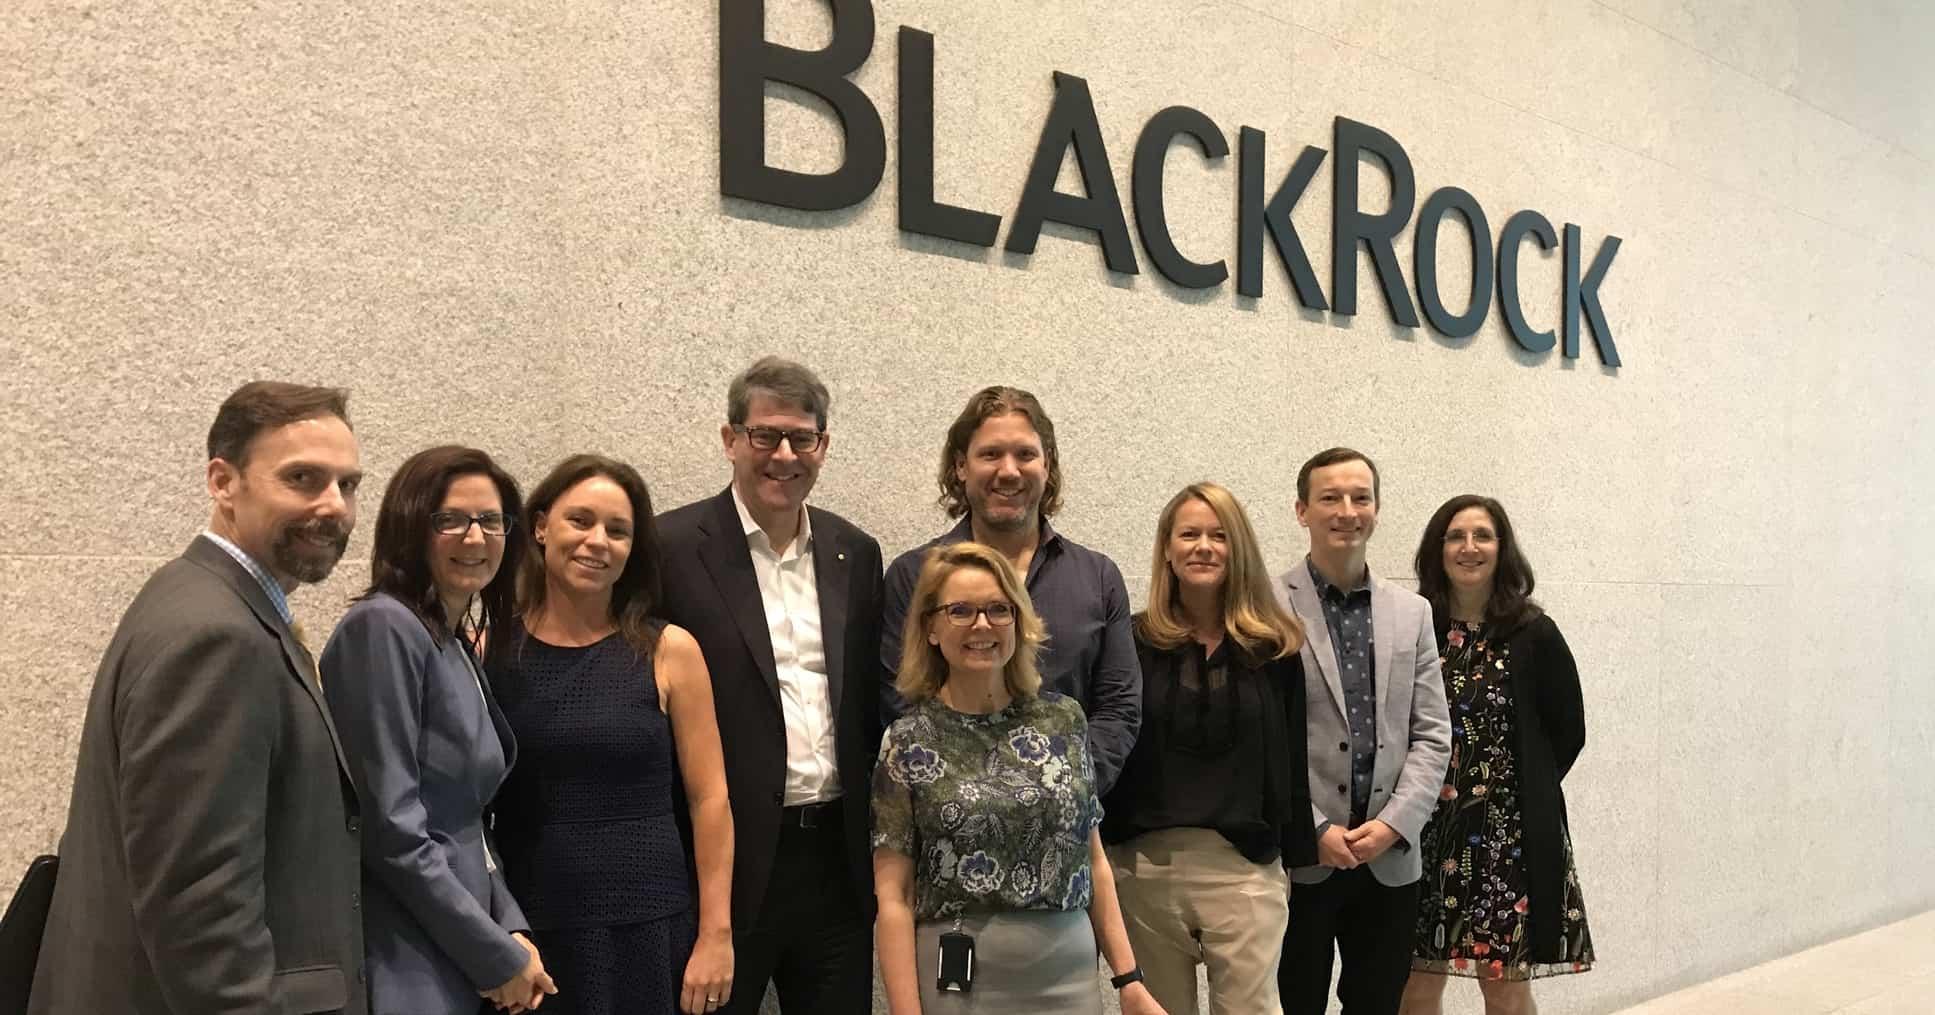 Blackrock staff at the headquarter office